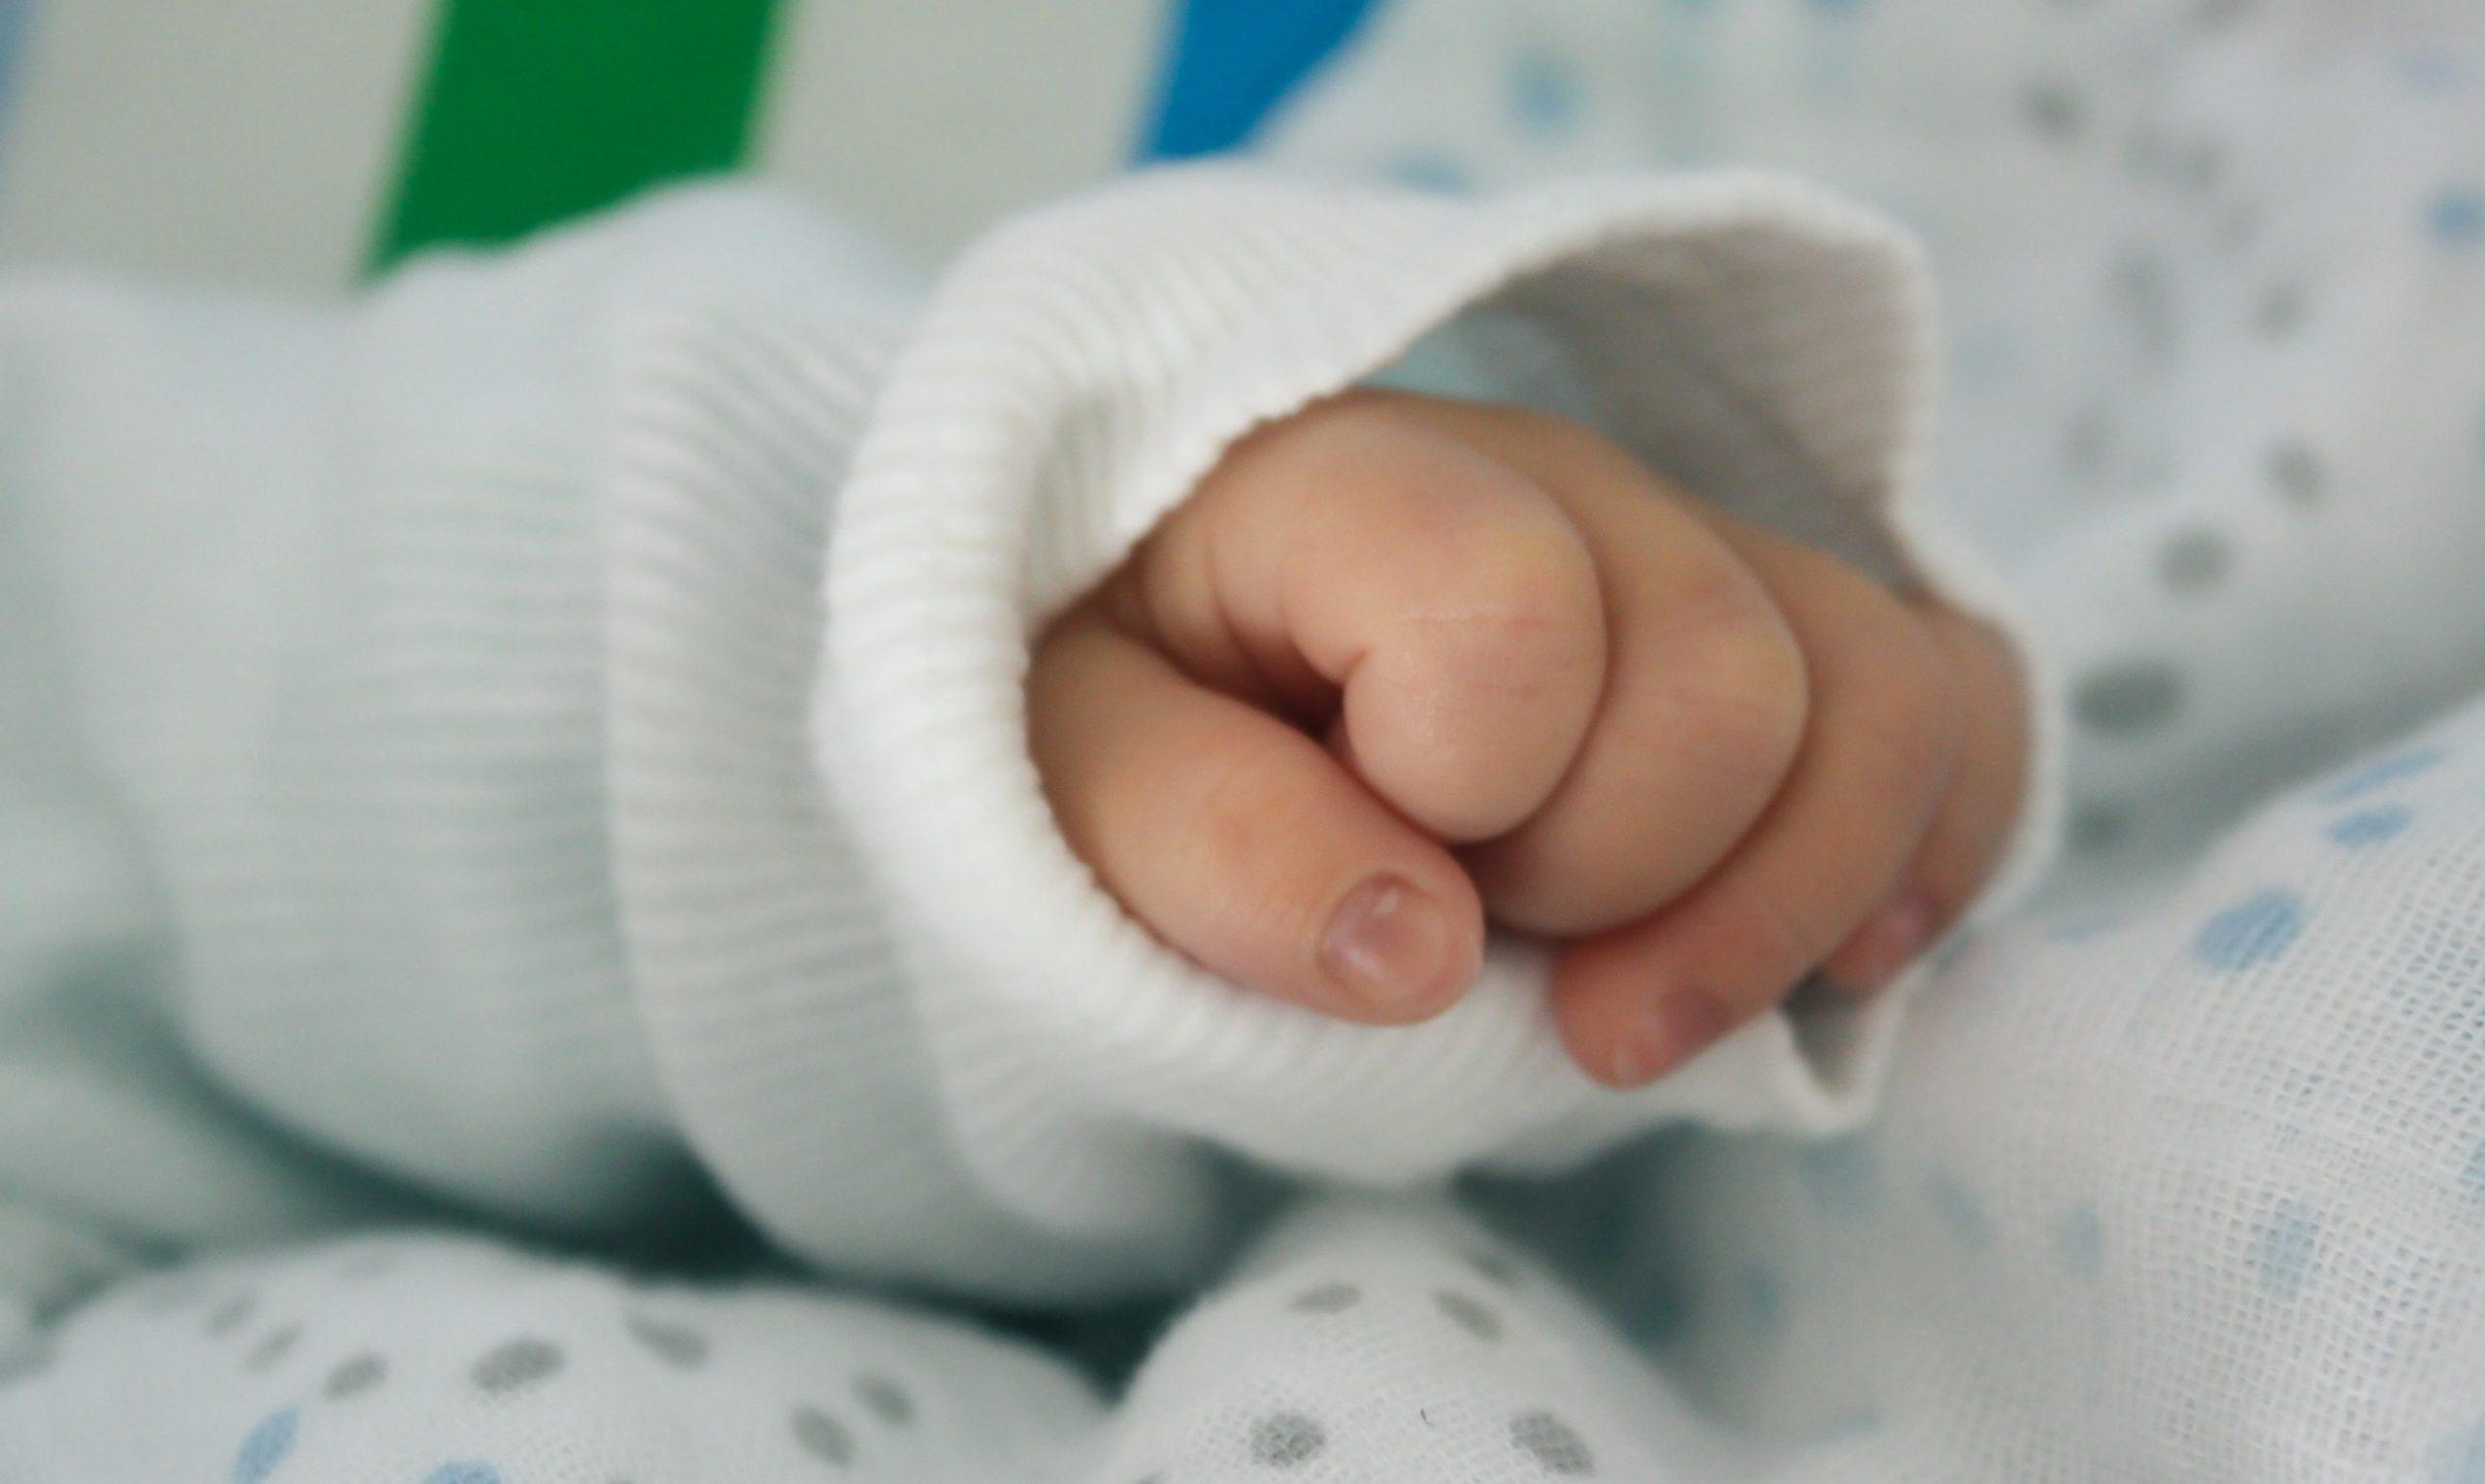 Newborn baby confirmed as youngest coronavirus patient in the UK